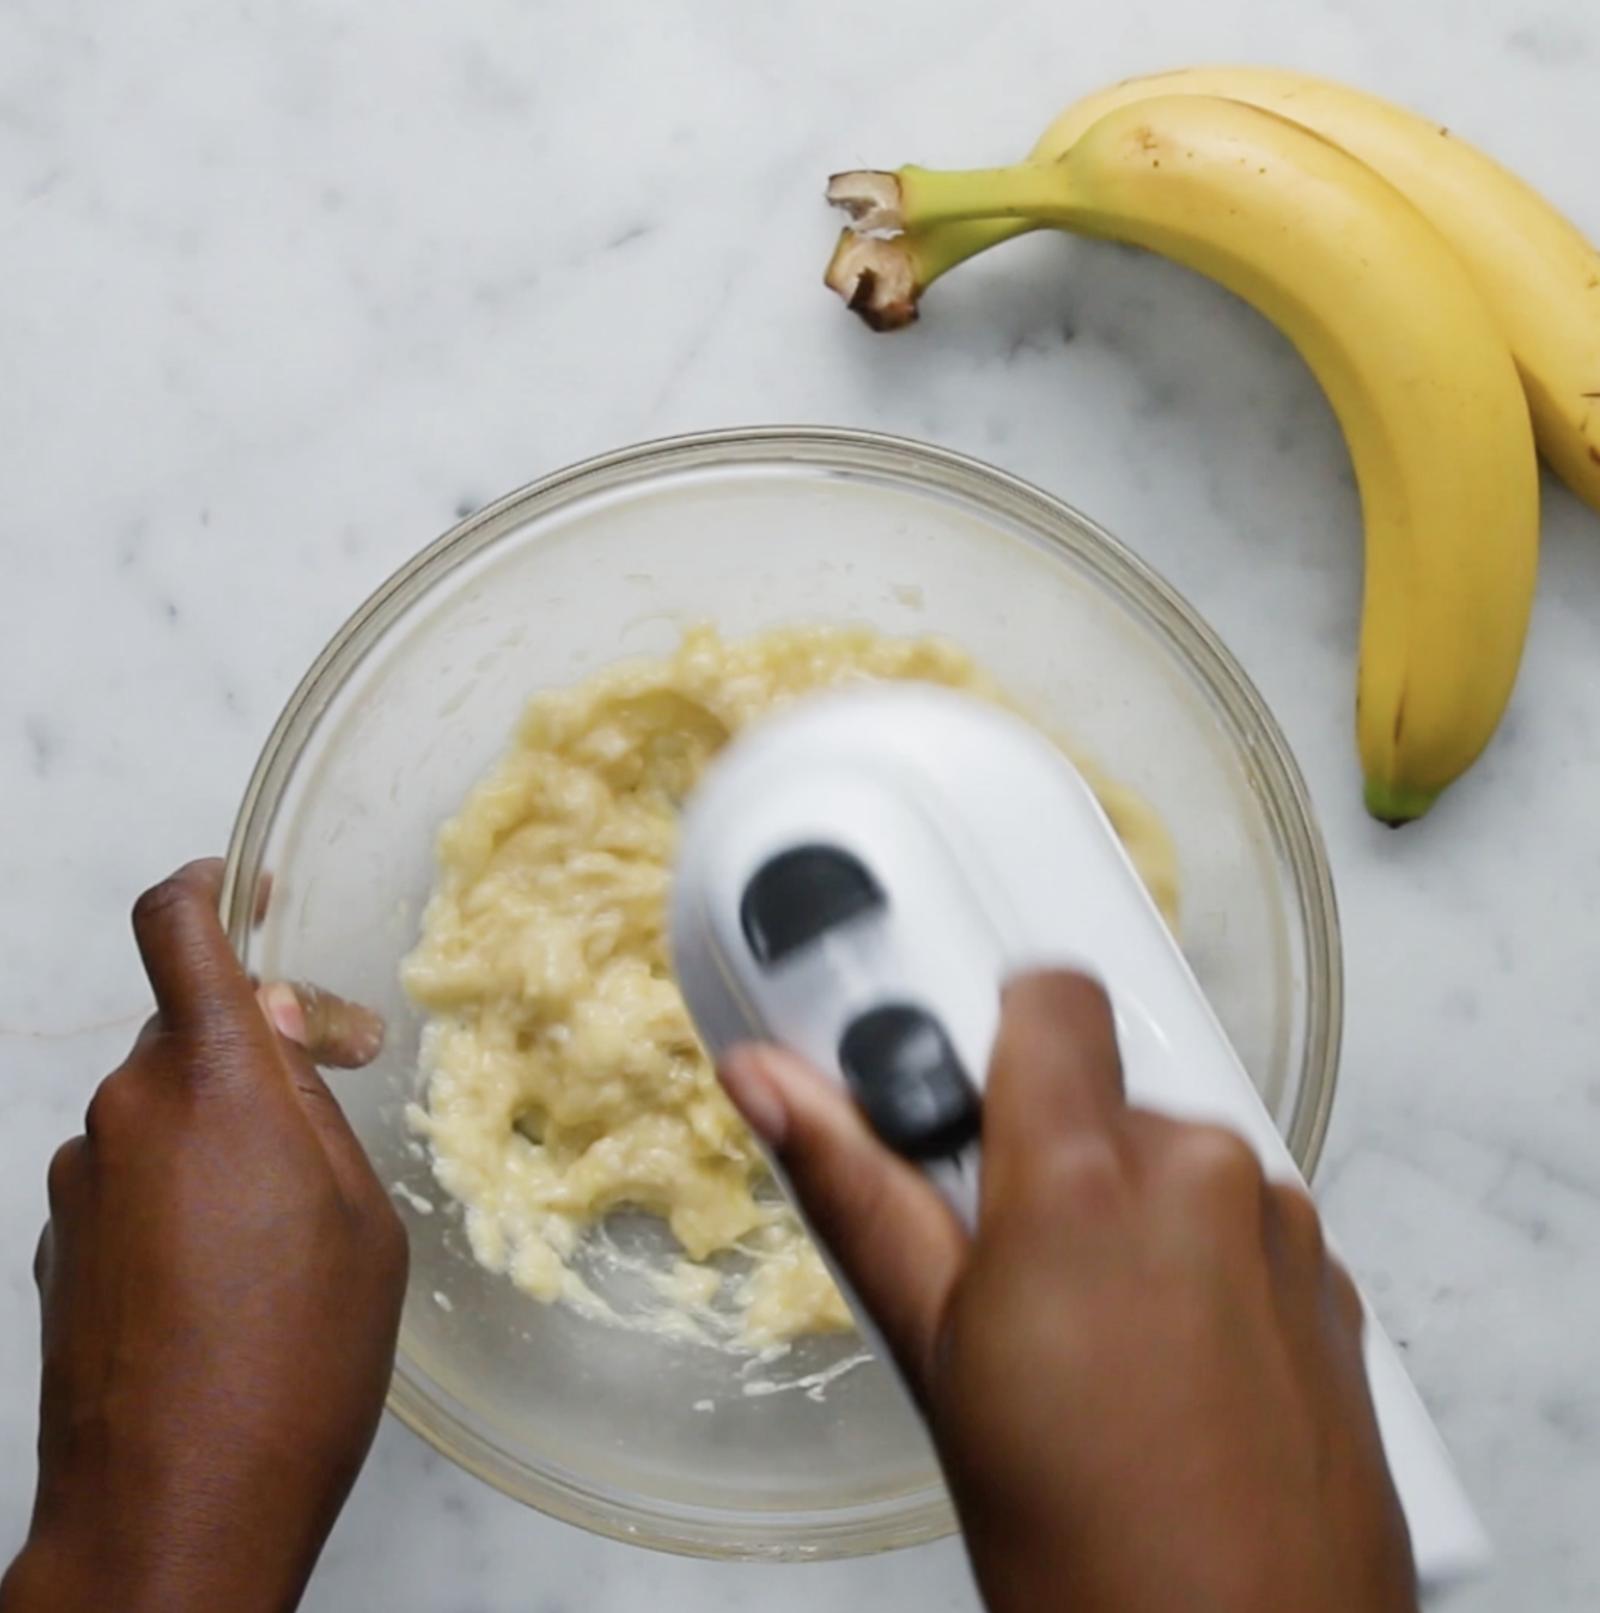 Probiersmal mit banane